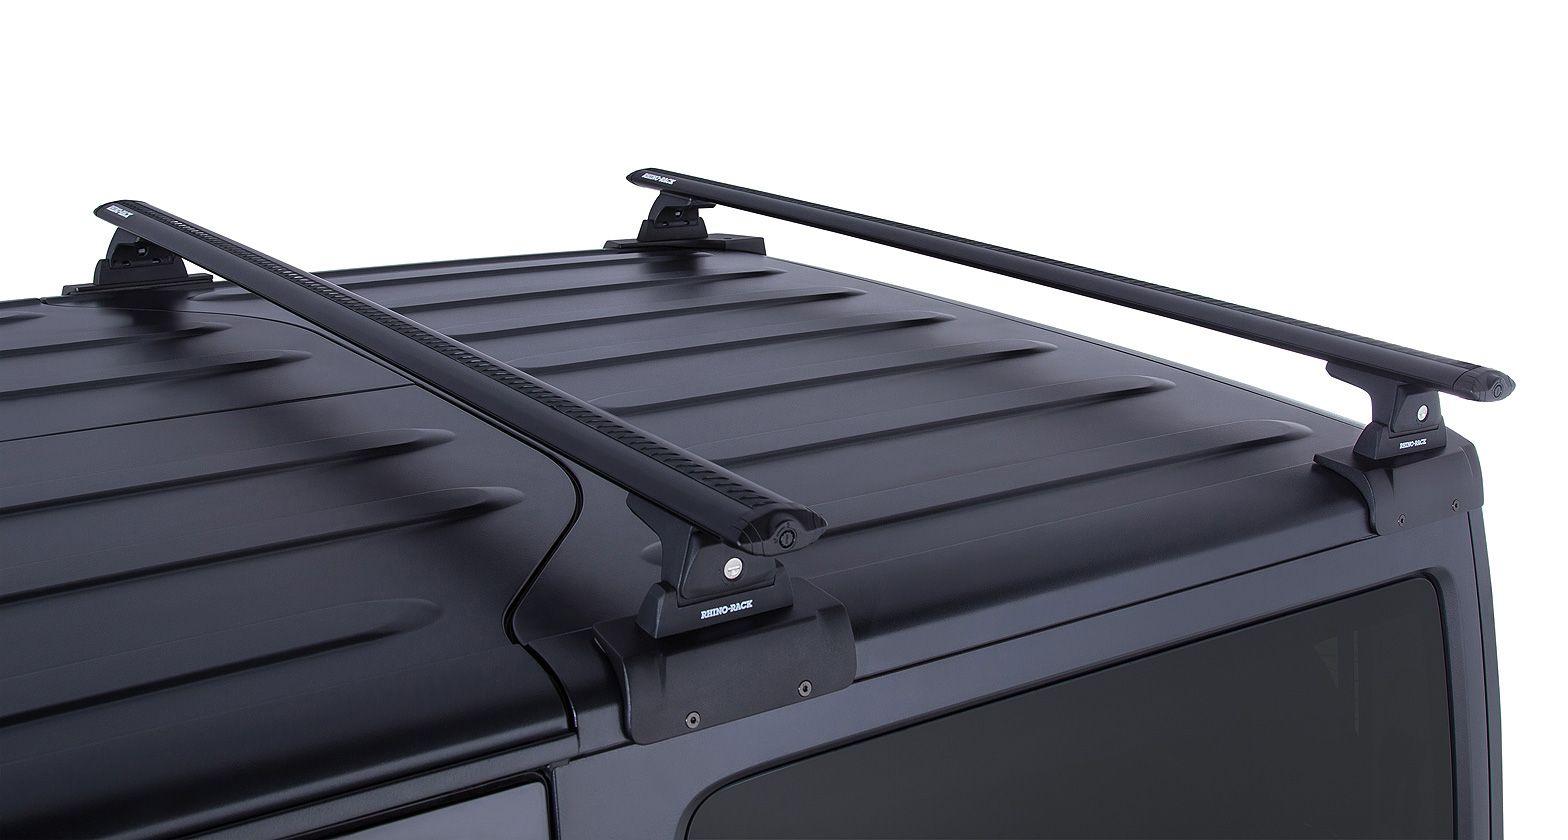 Rhino Rack Vortex Rlt600 Black 2 Bar Backbone Roof Rack For 2 Door